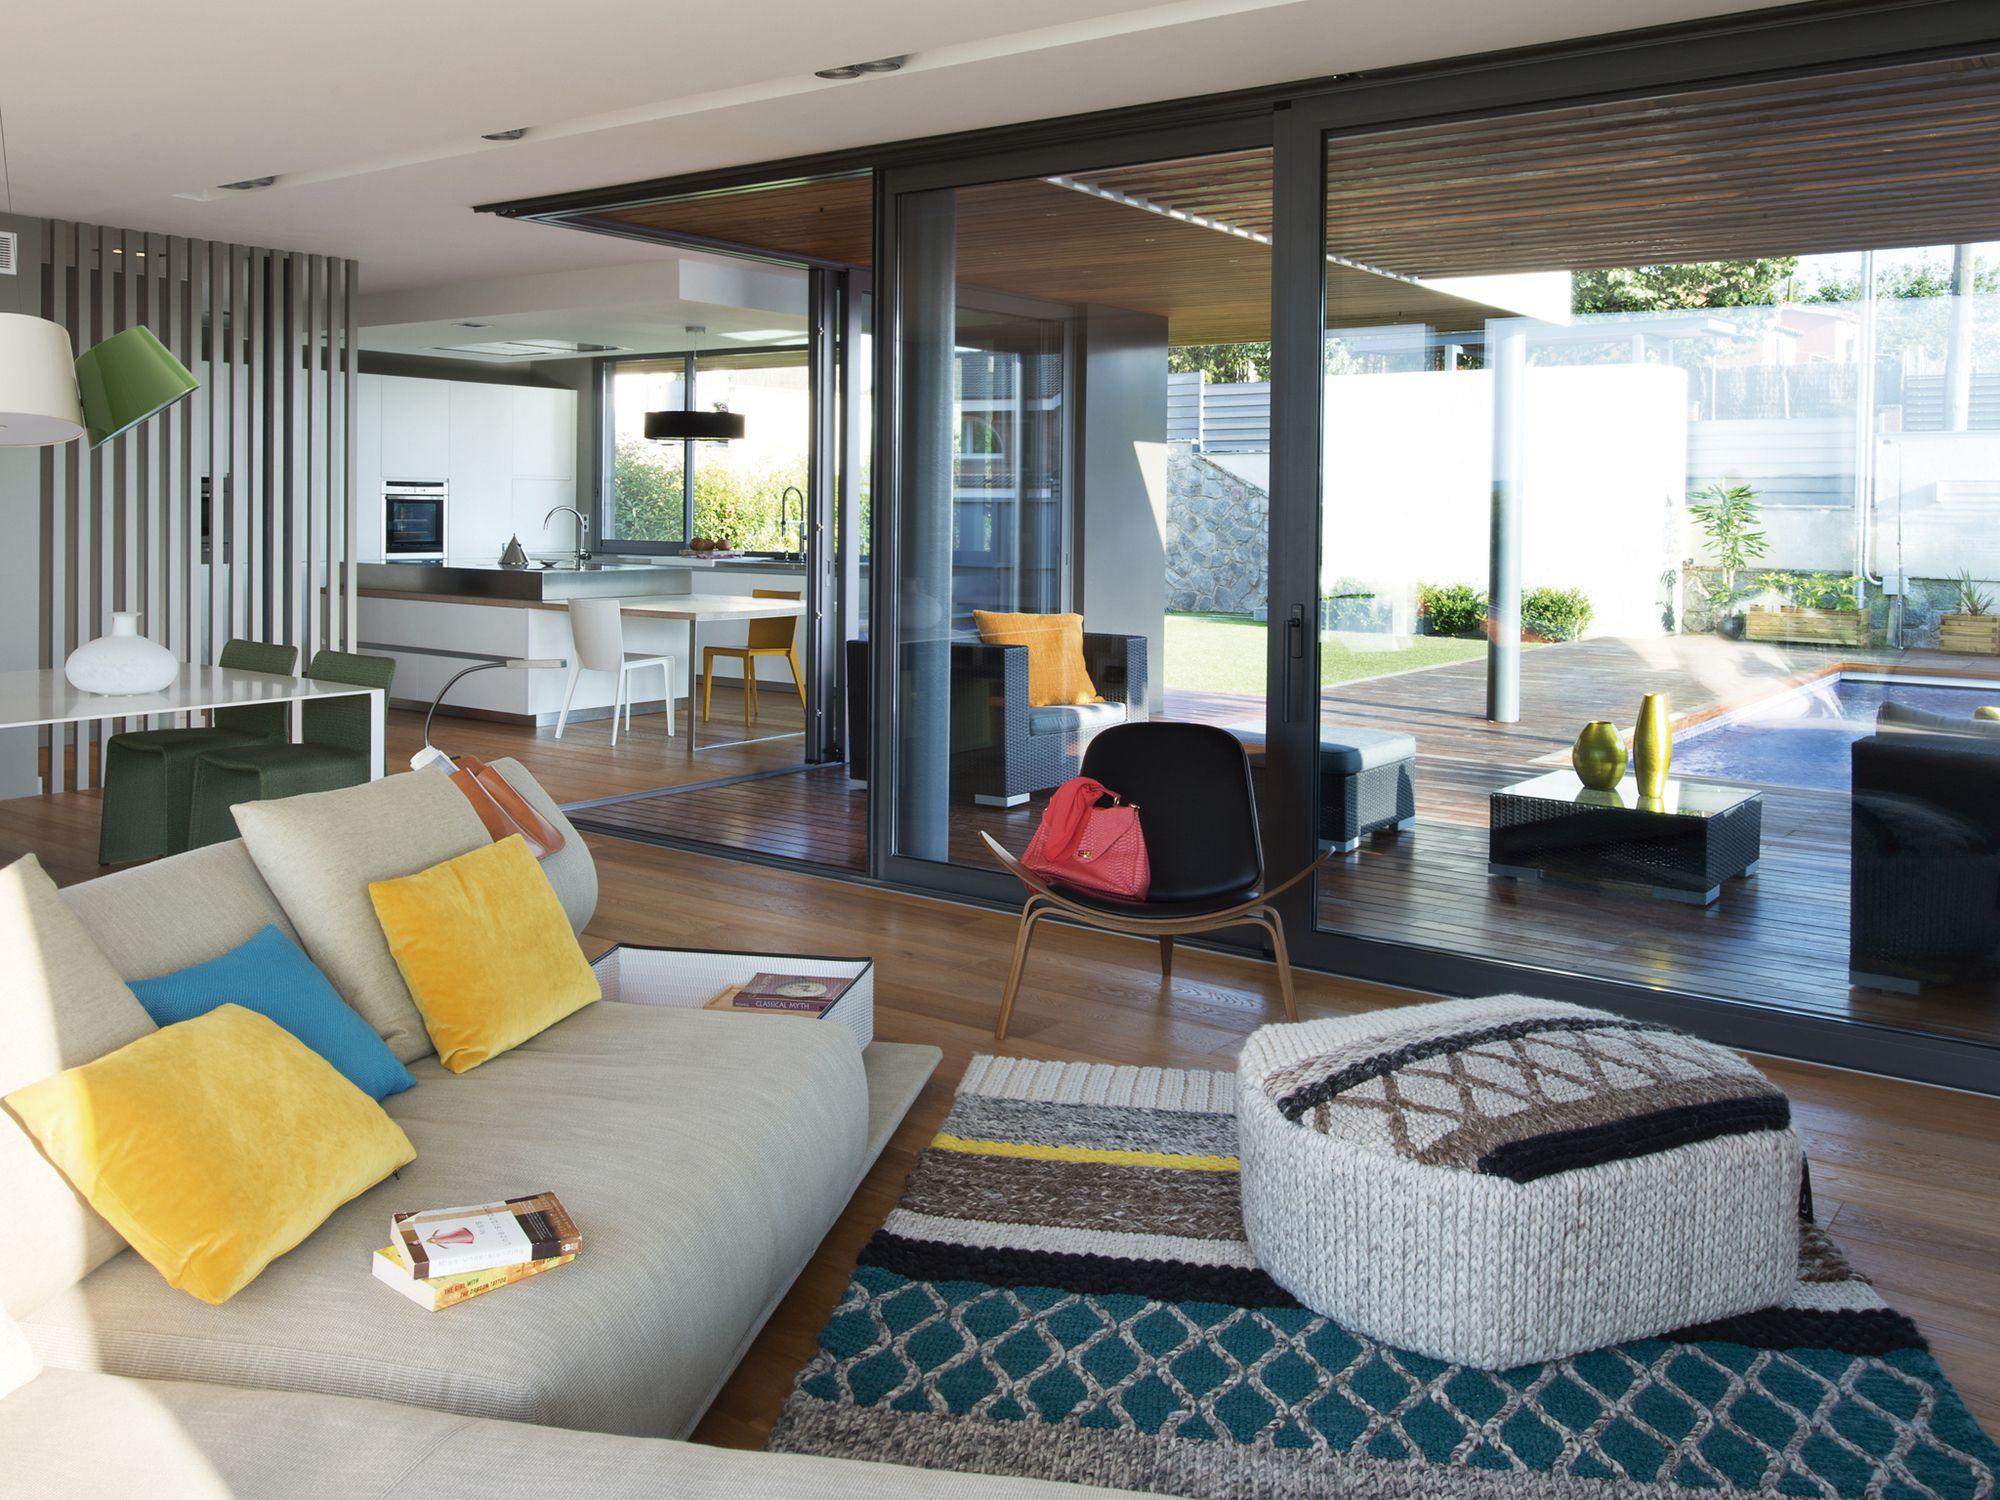 Gallery of r house artigas arquitectes 5 architecture house interior house design